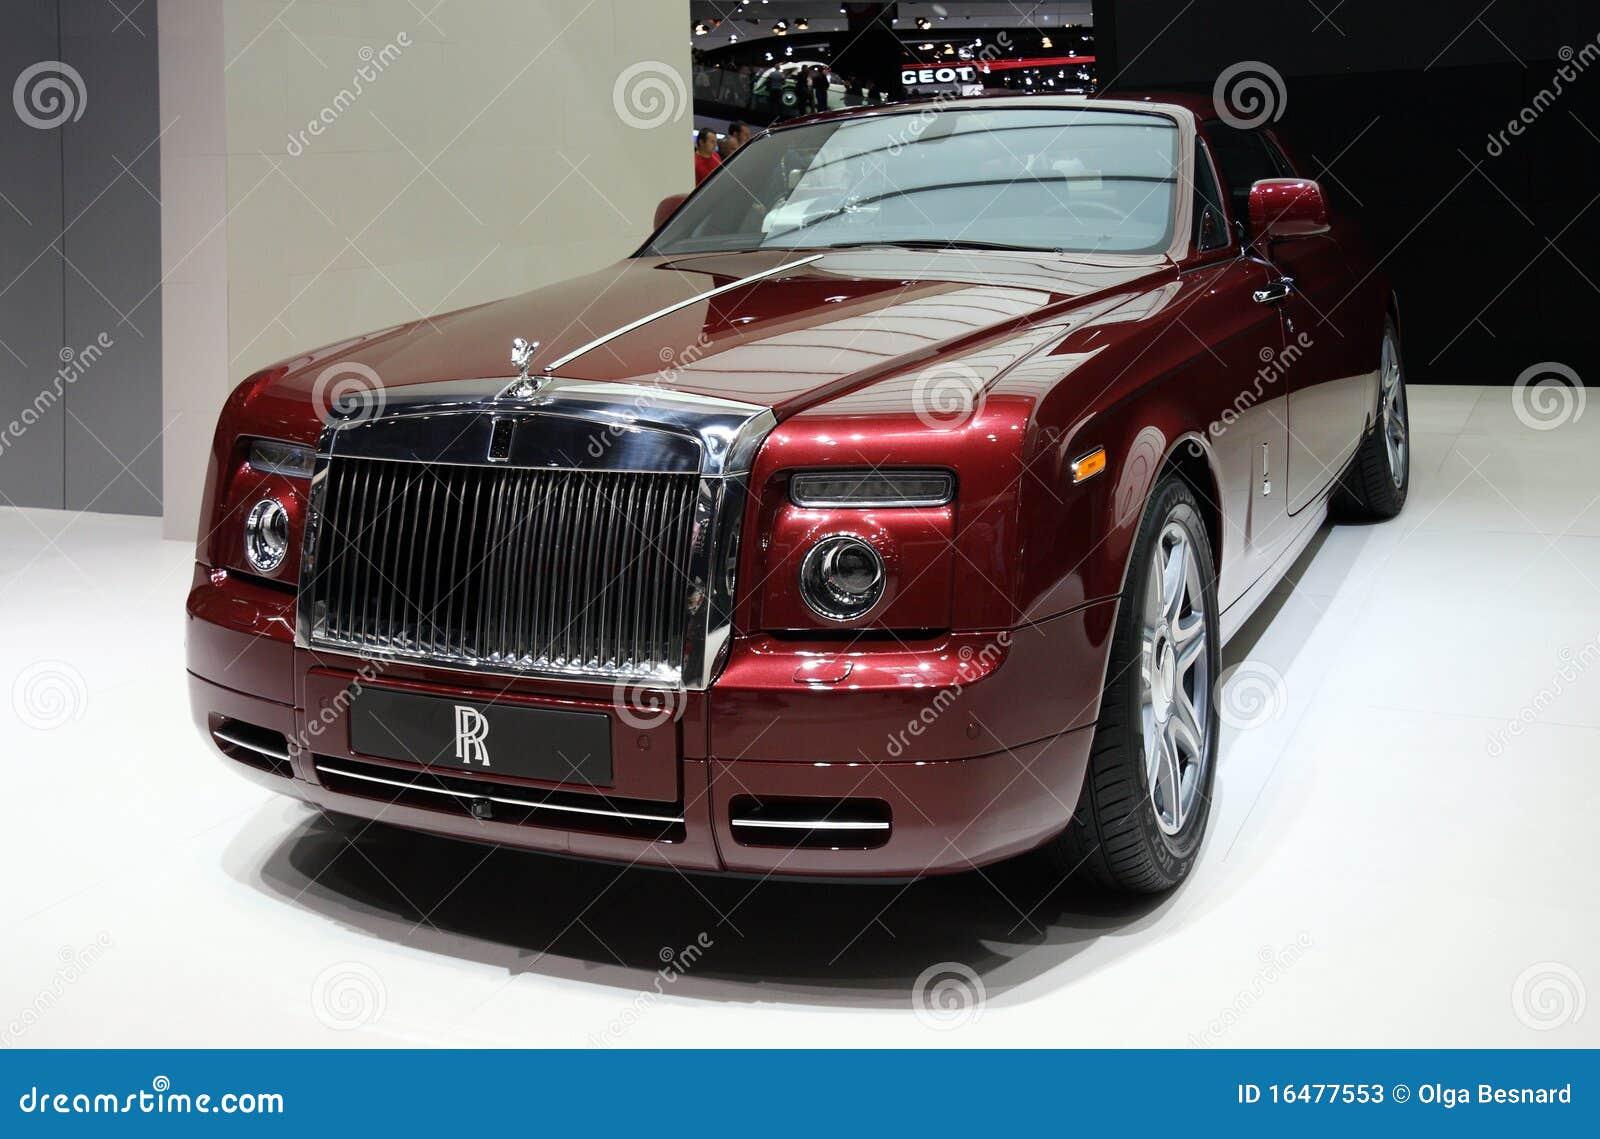 Rolls royce phantom coupe at paris motor show editorial for Rolls royce phantom motor